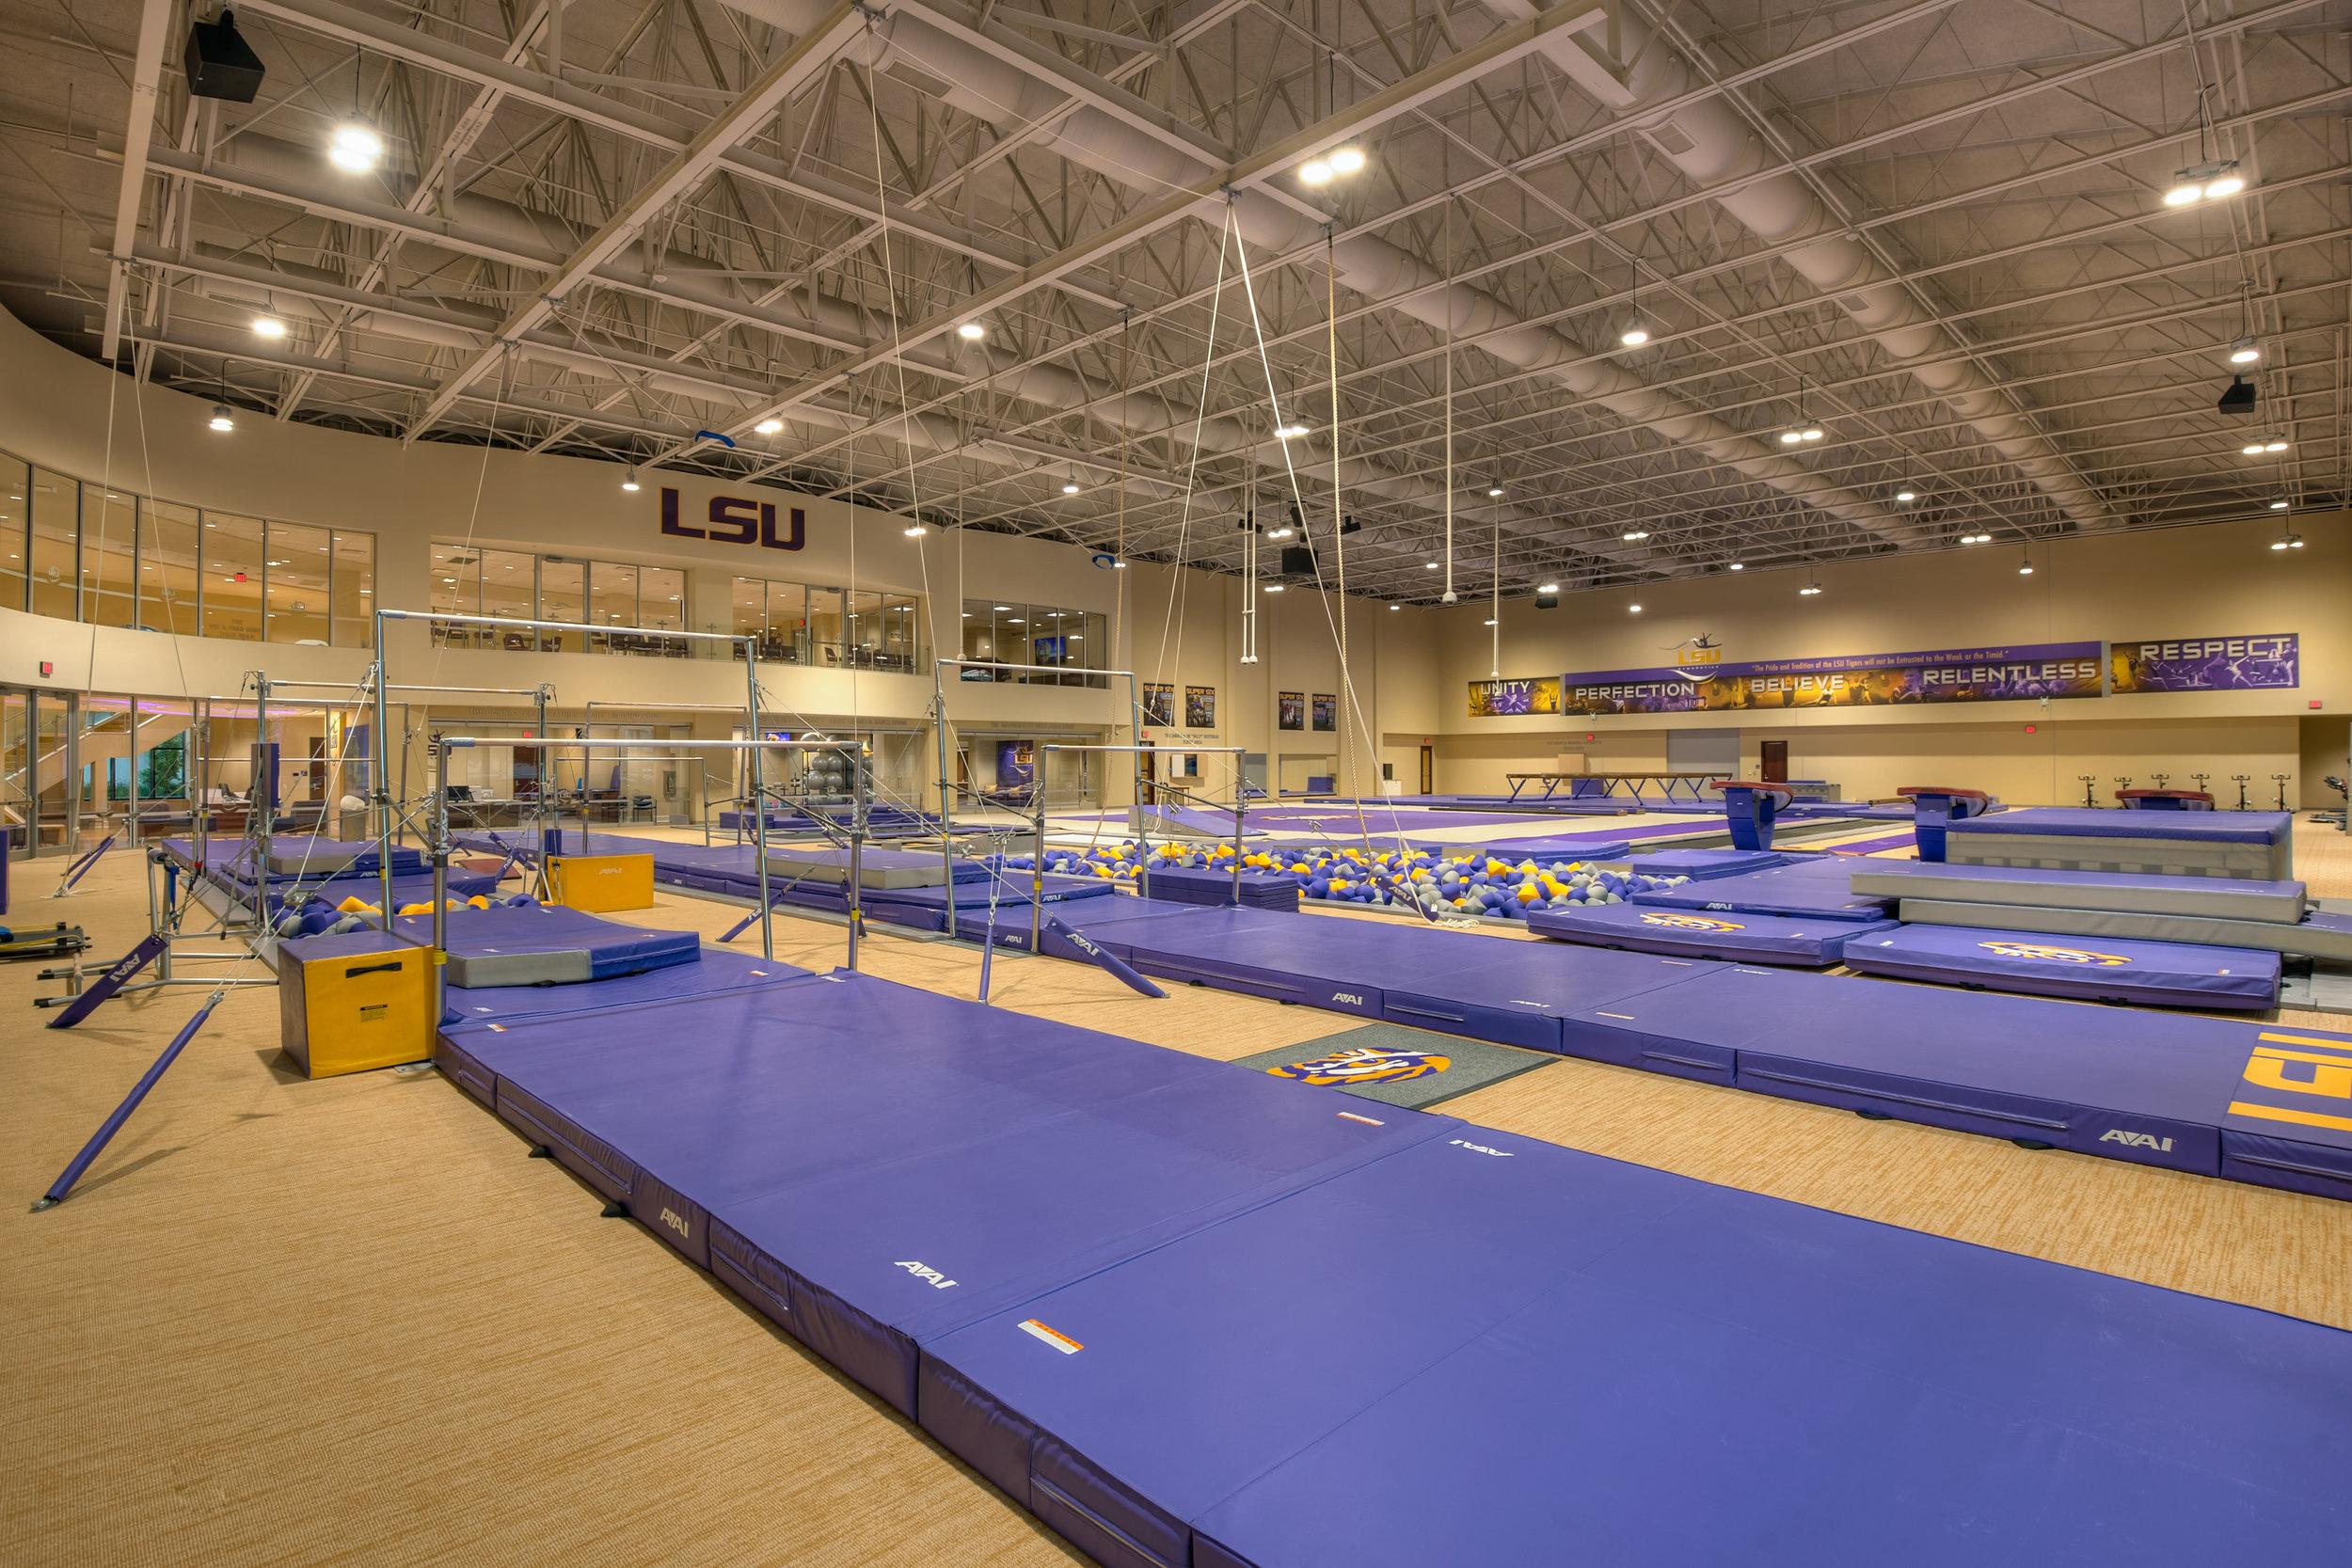 LSU Gymnastics 8.jpg